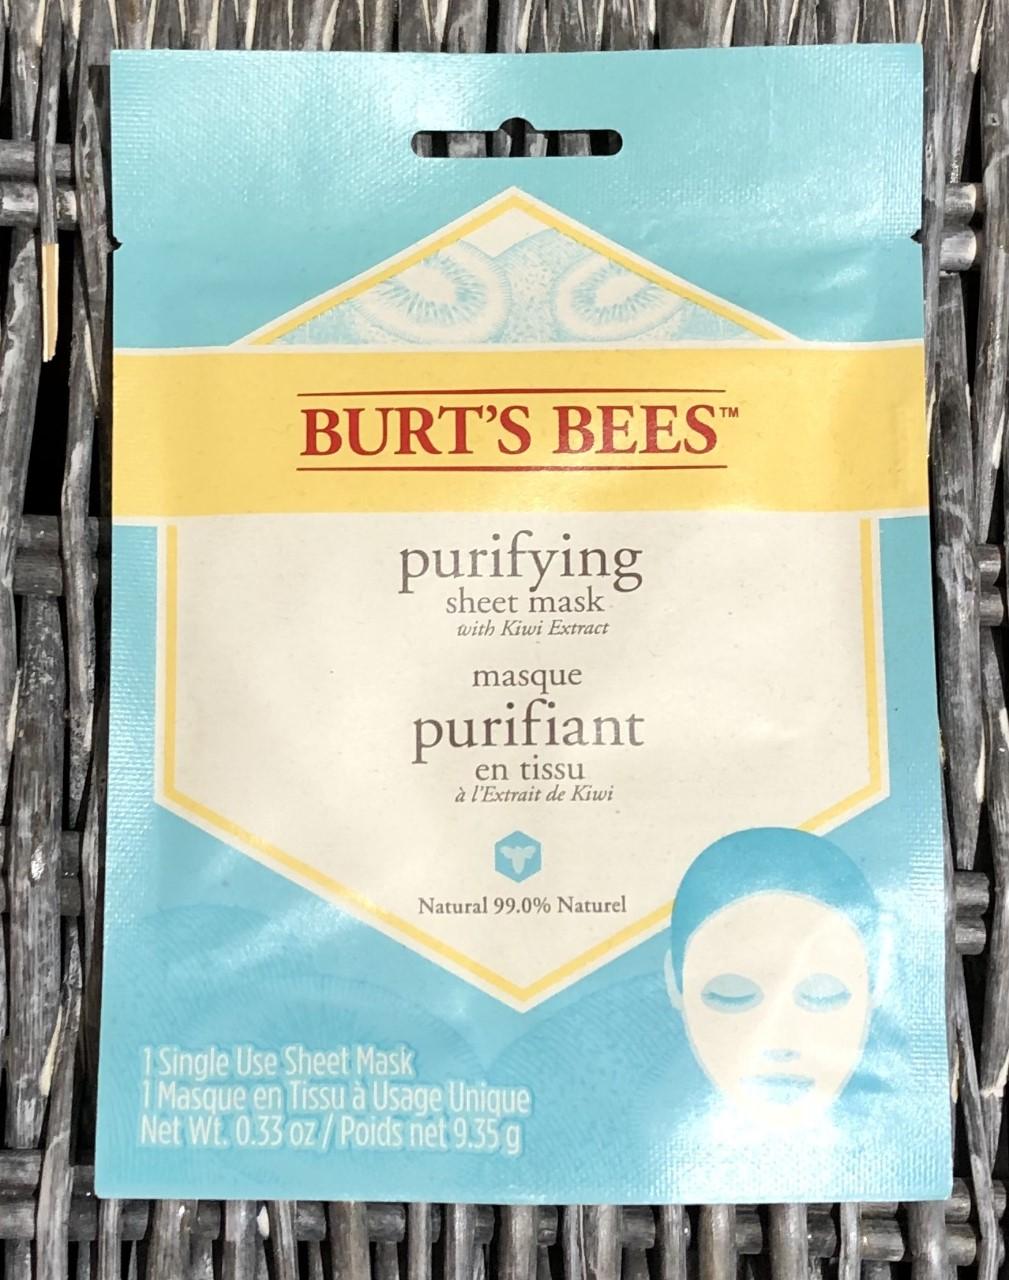 Burts bees face mask